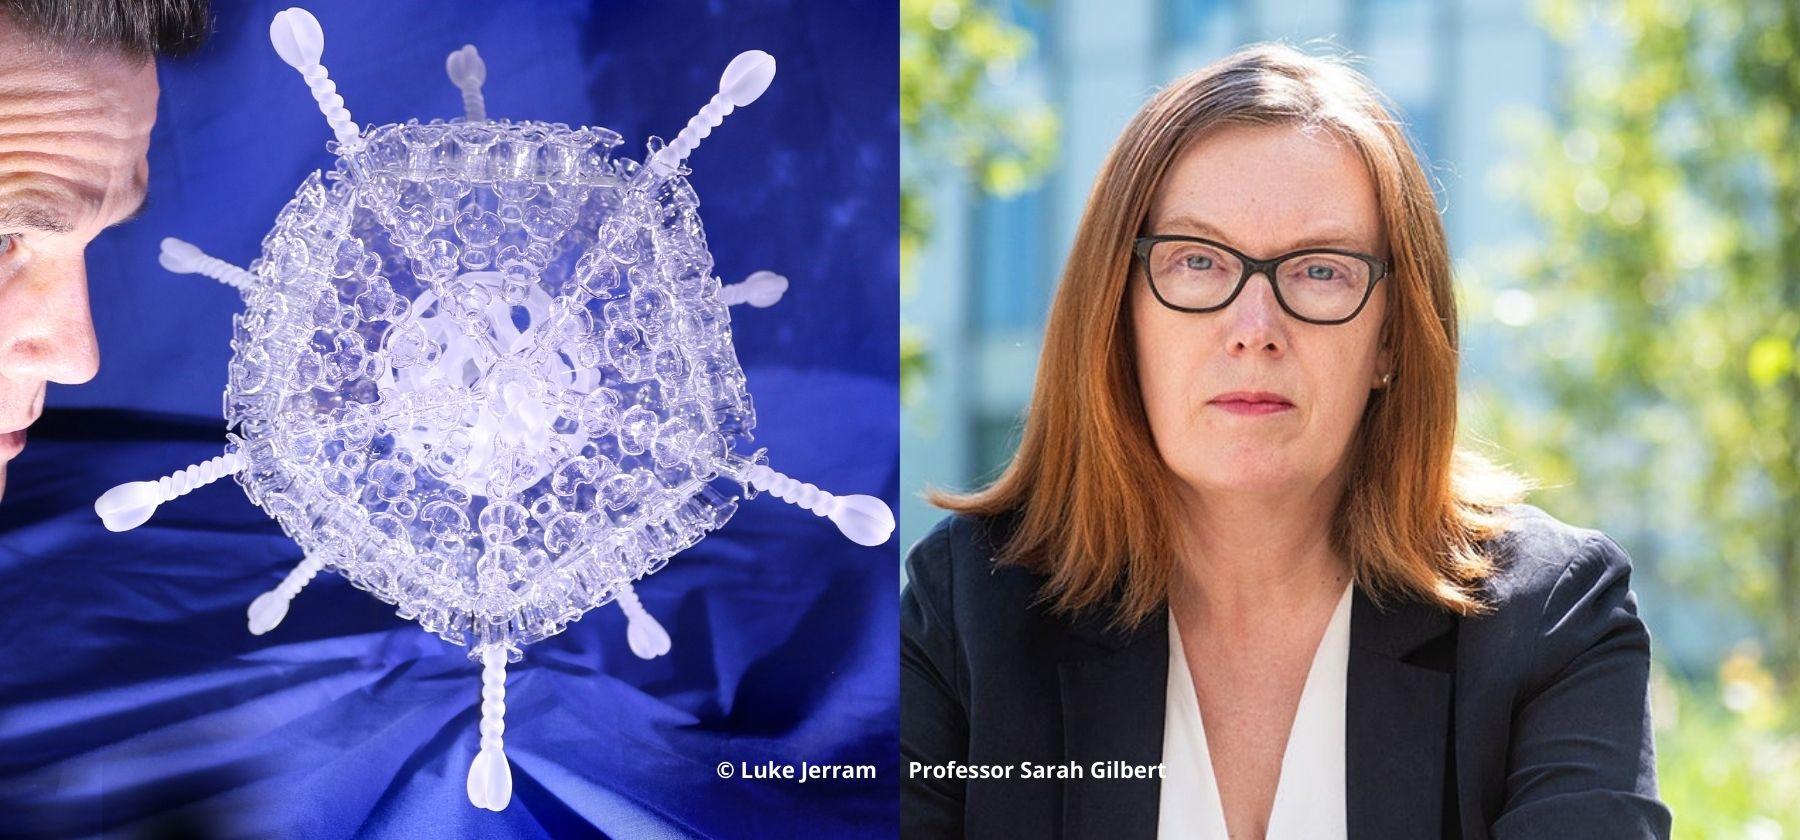 Luke Jerram COVID Vaccine sculpture with Professor Sarah Gilbert